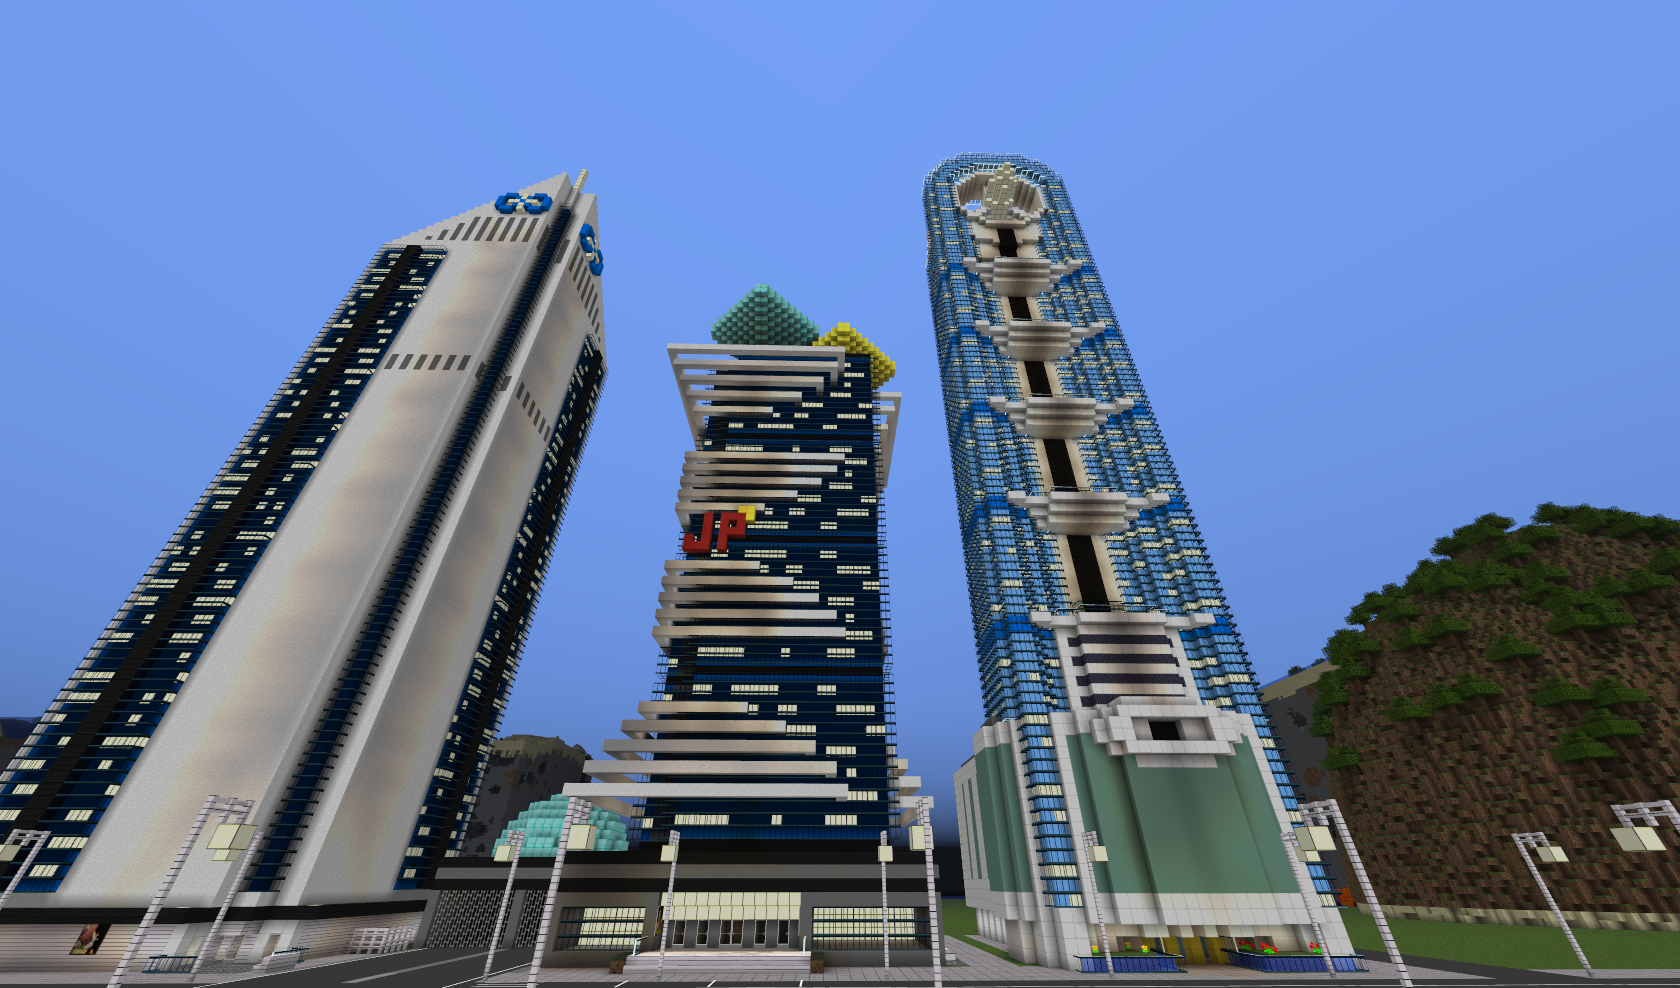 Amazing Minecraft Creations